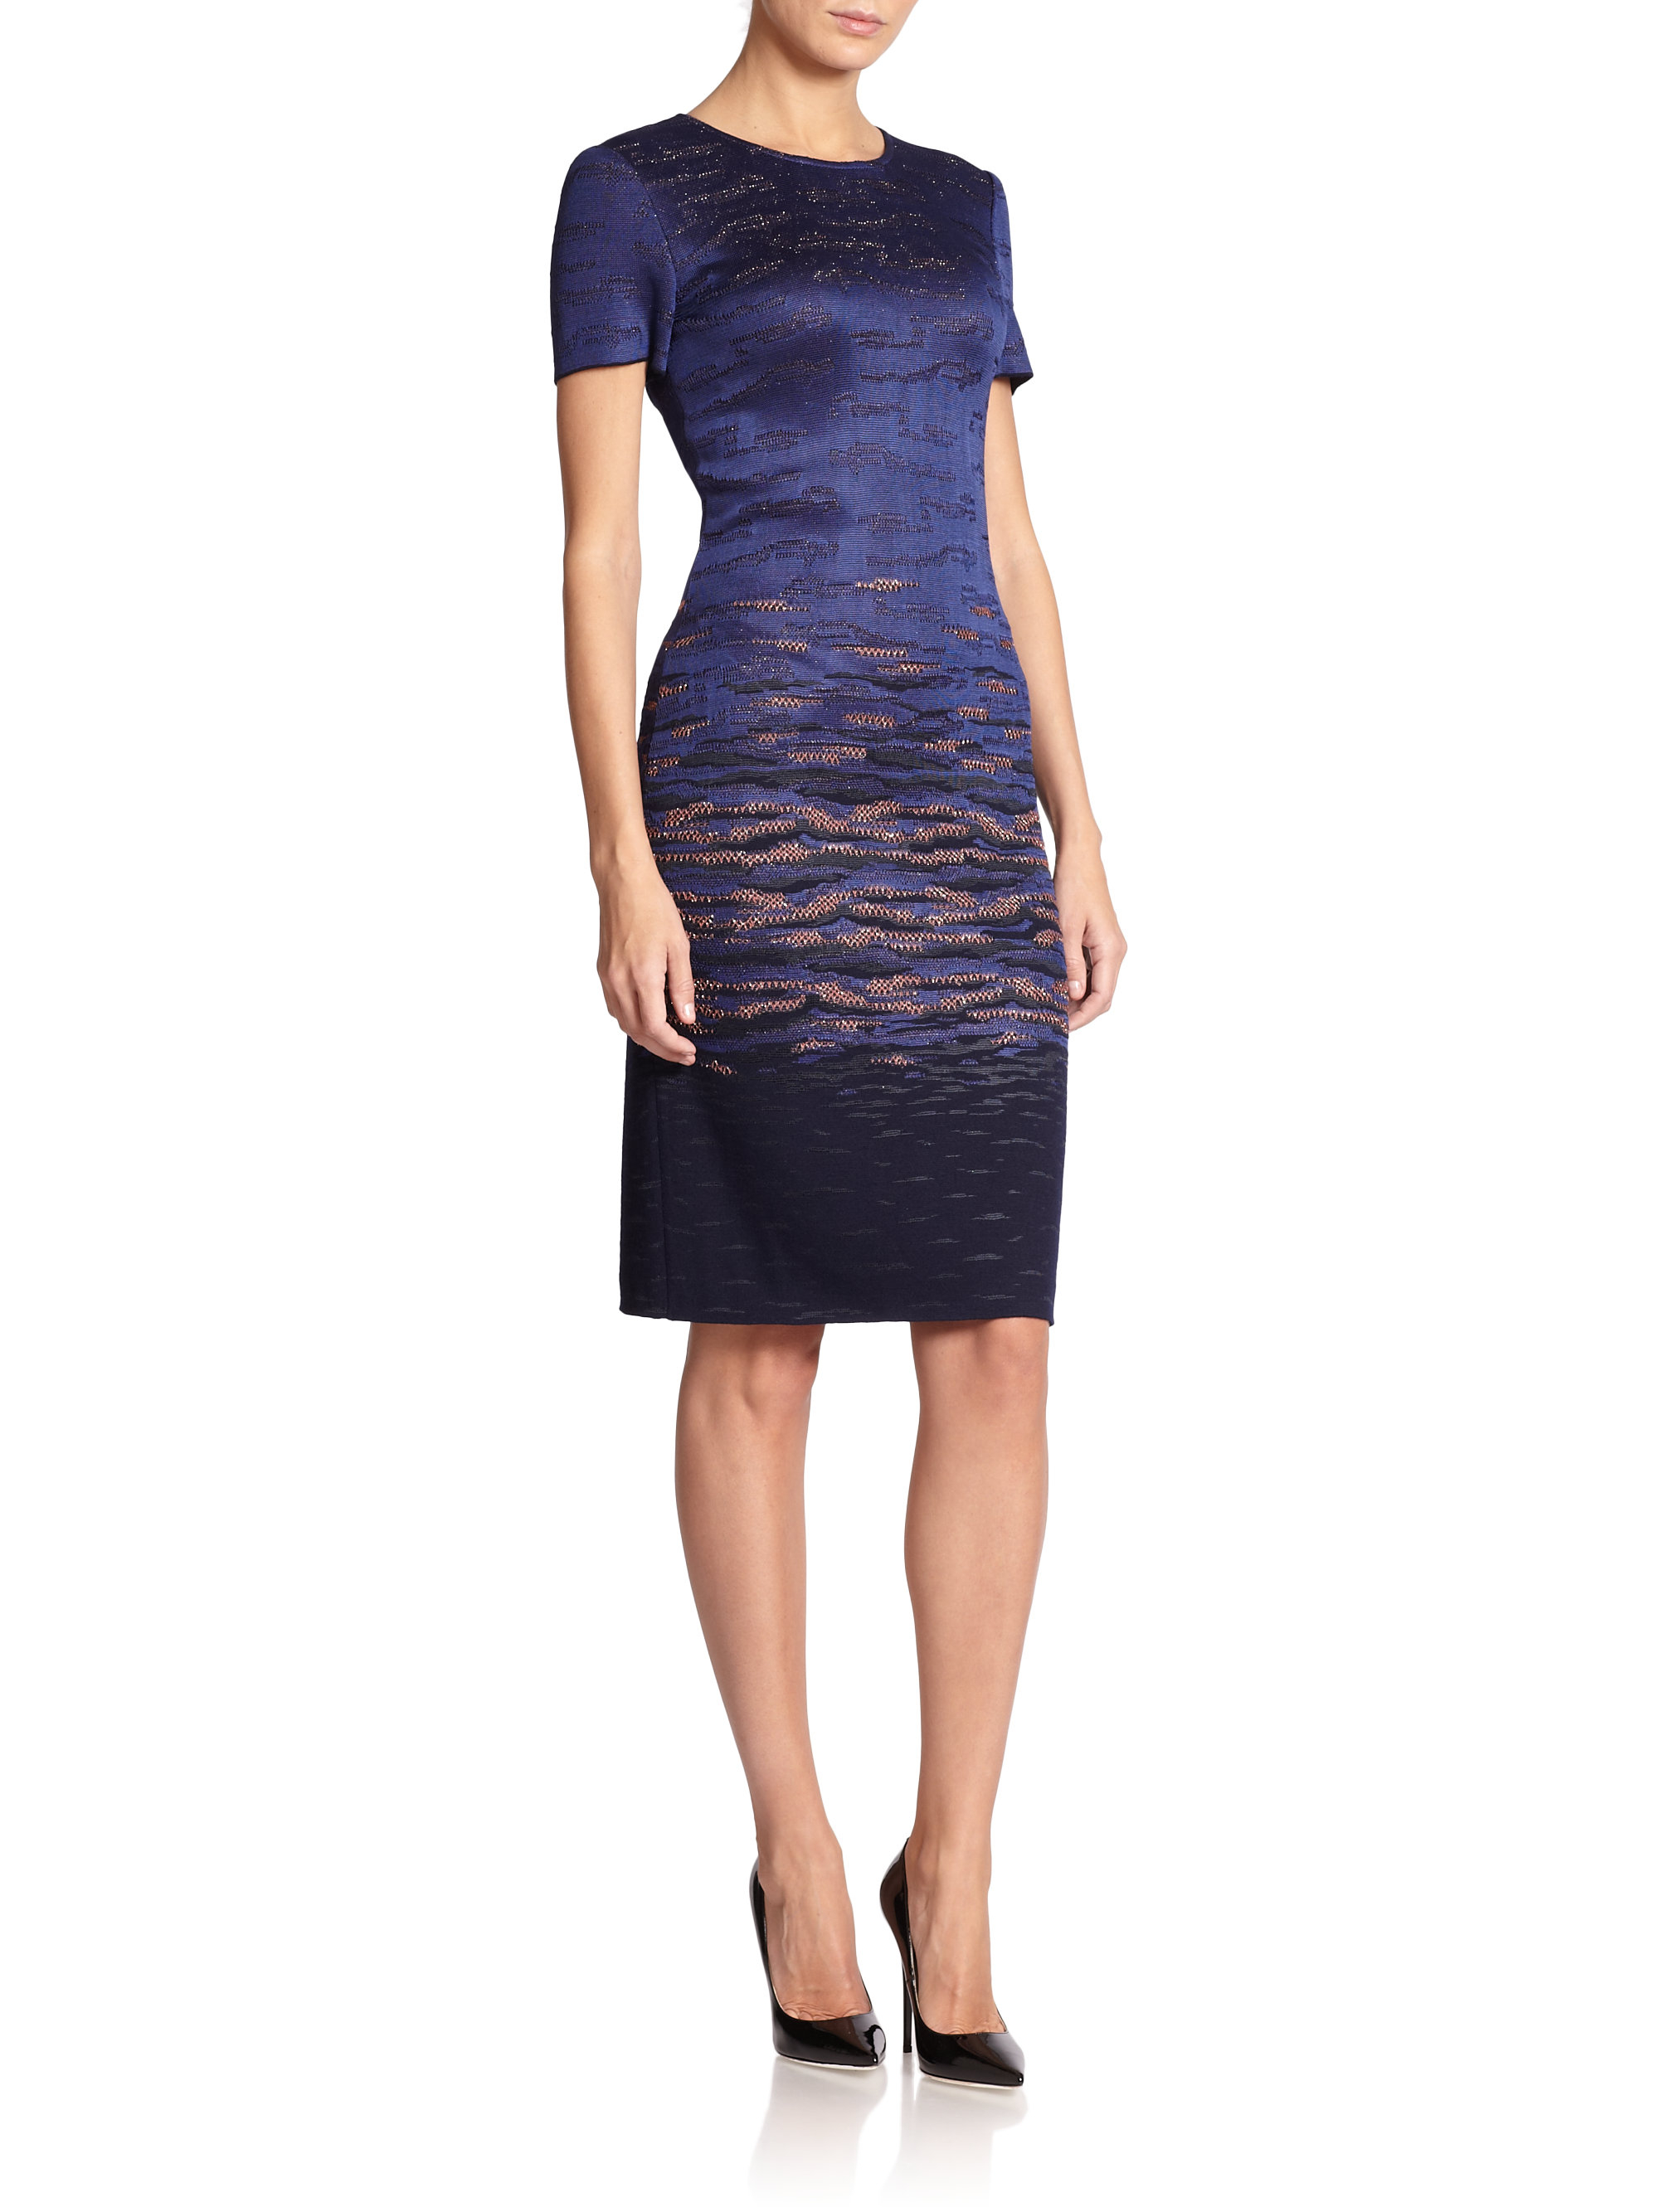 ee1fd384dfac Lyst - St. John Sunset Jacquard Knit Dress in Blue